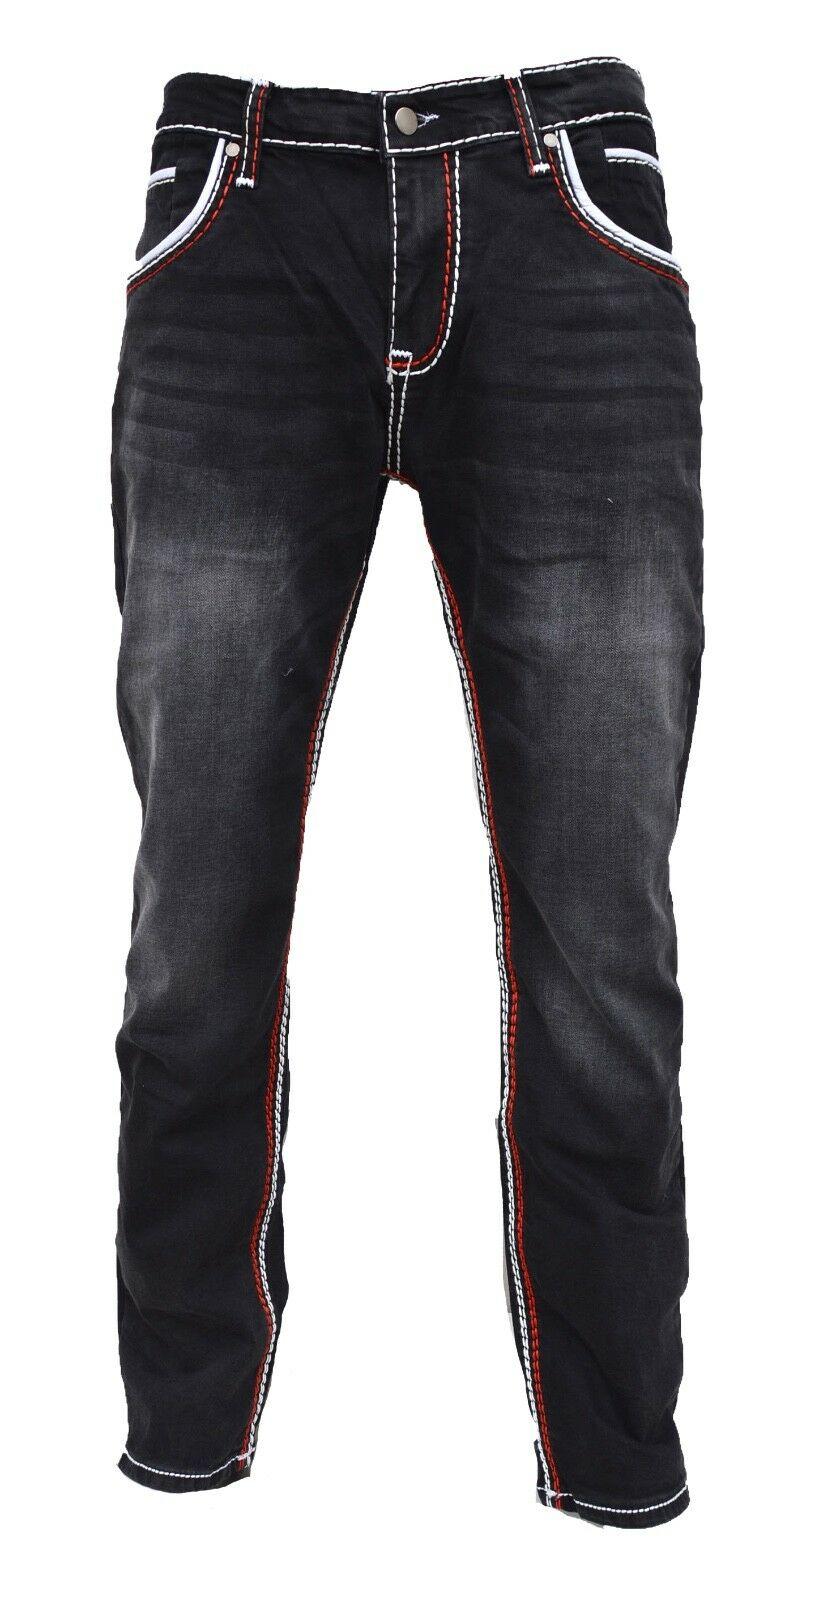 Herren-Jeans-Hose-Denim-KC-Black-Washed-Straight-Cut-Regular-Dicke-Naht-naehte Indexbild 17